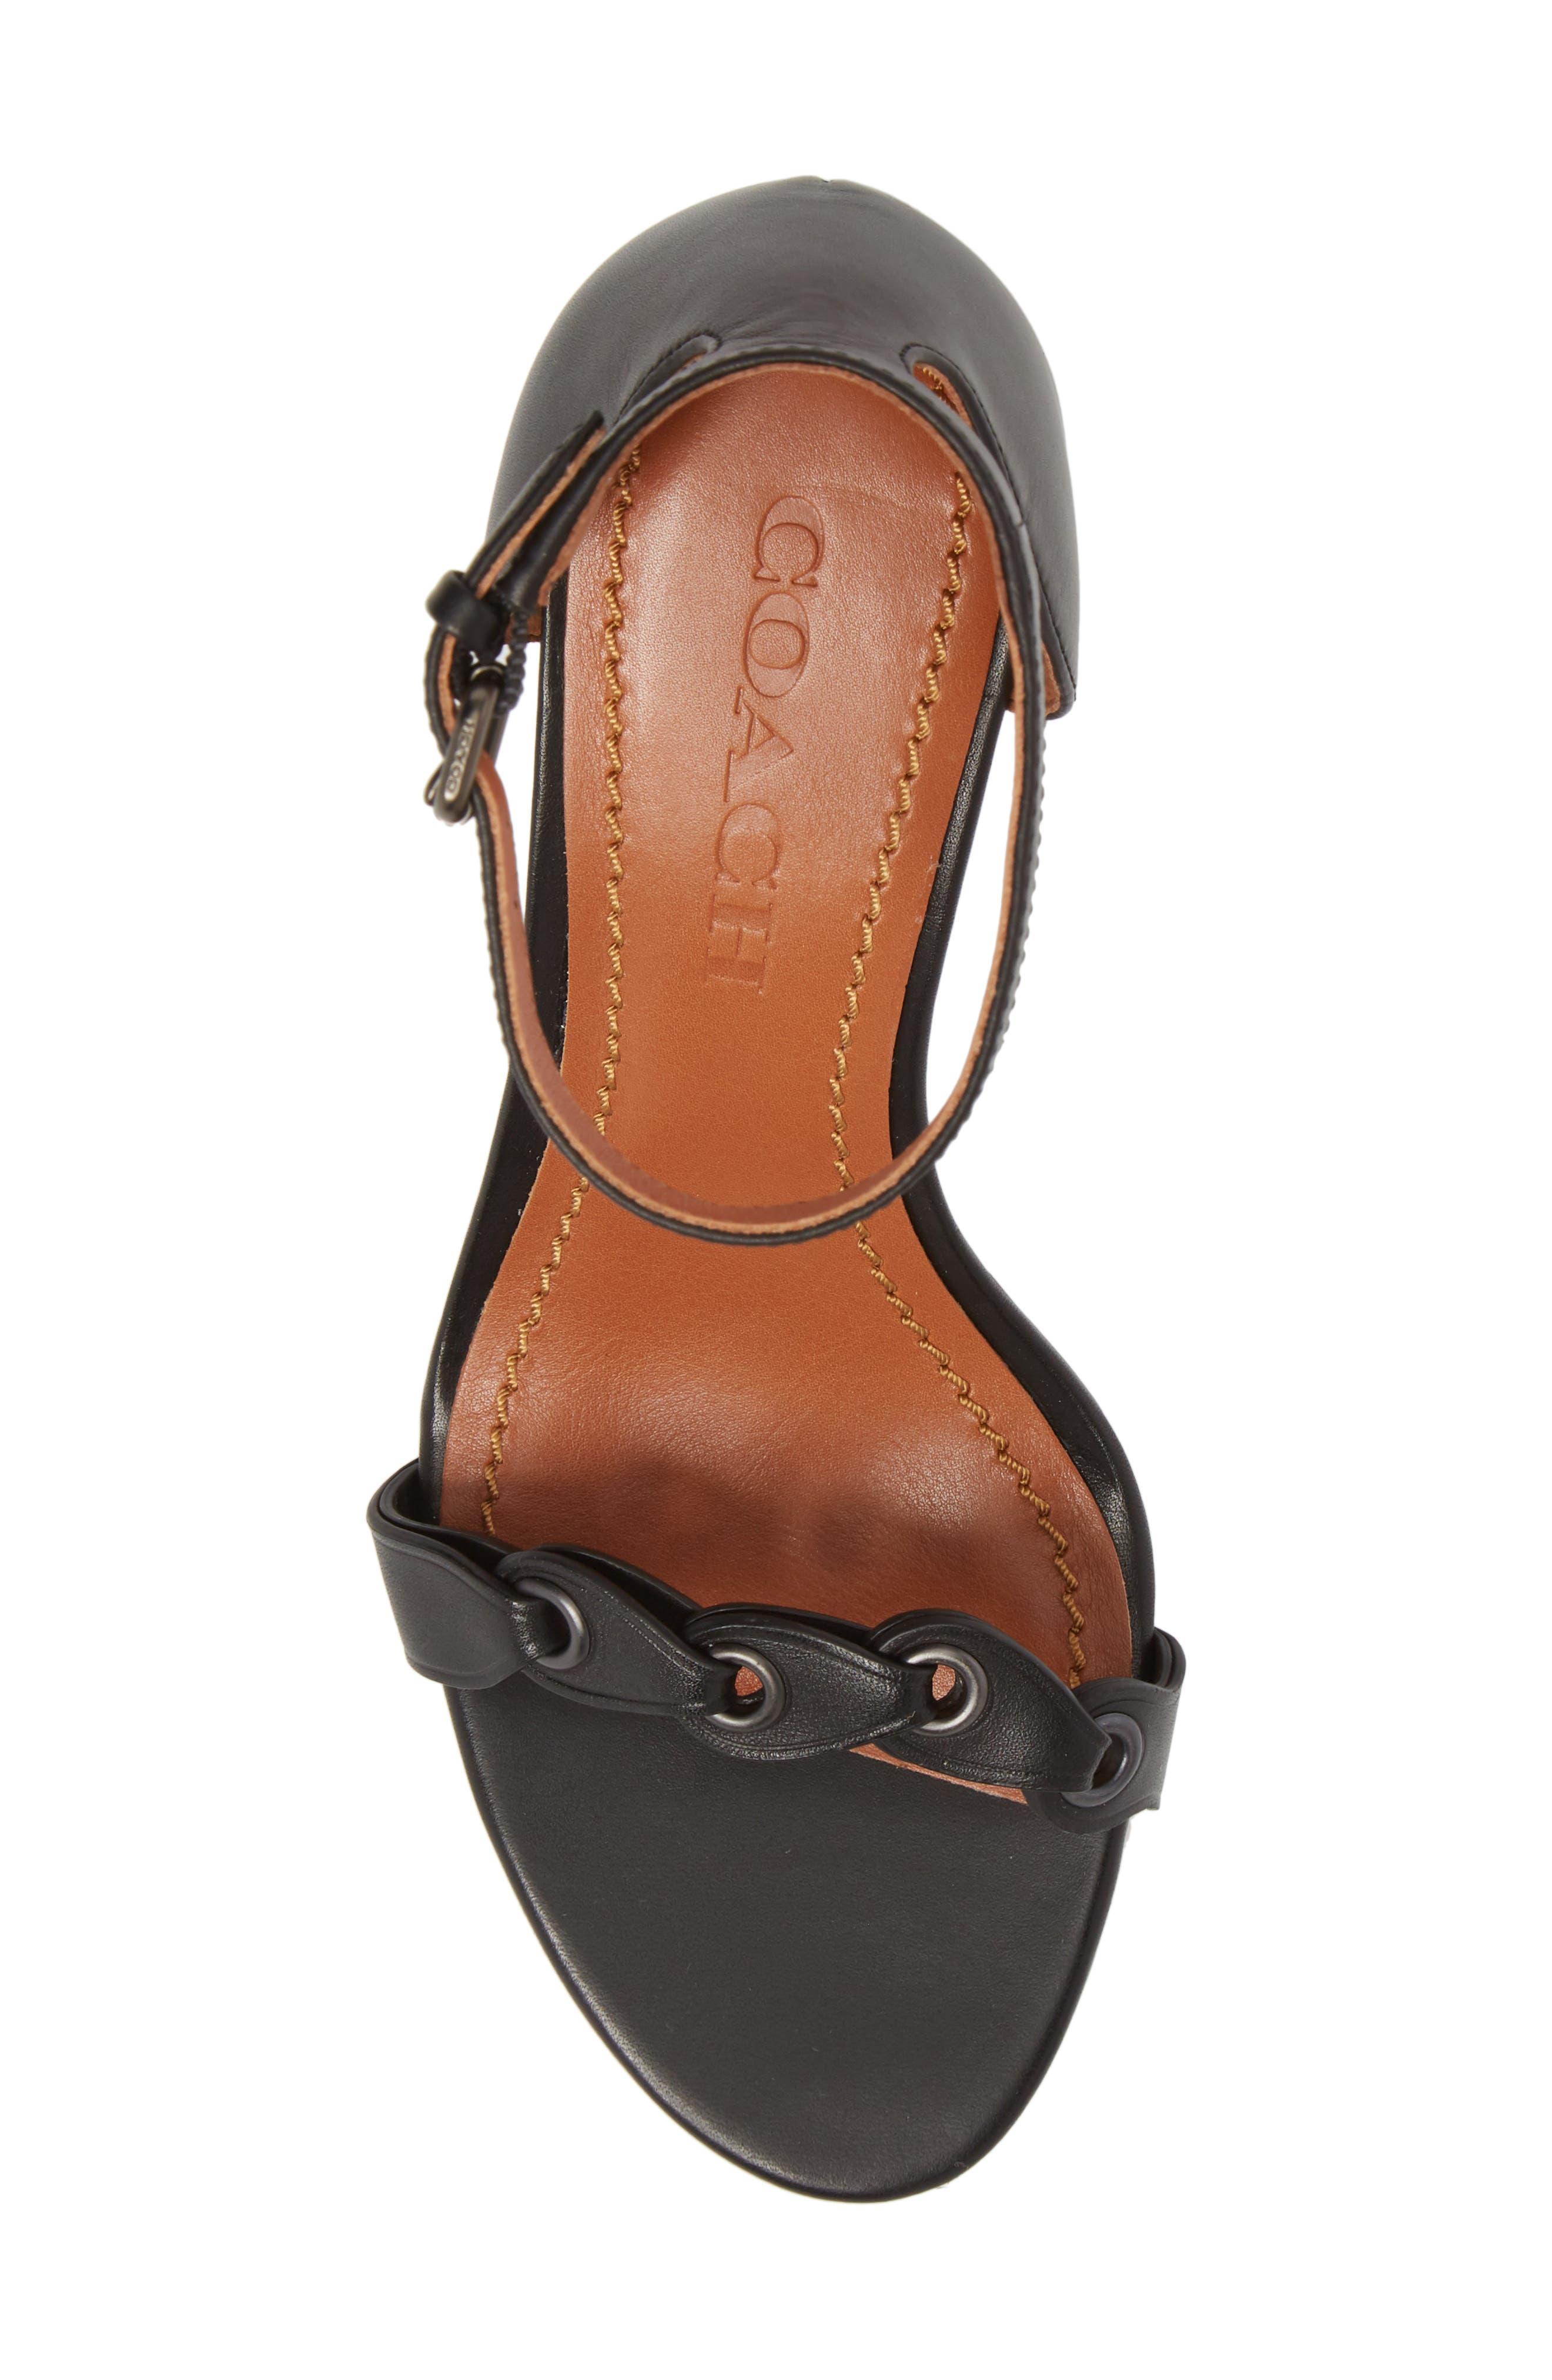 Link Ankle Strap Sandal,                             Alternate thumbnail 5, color,                             Black Leather